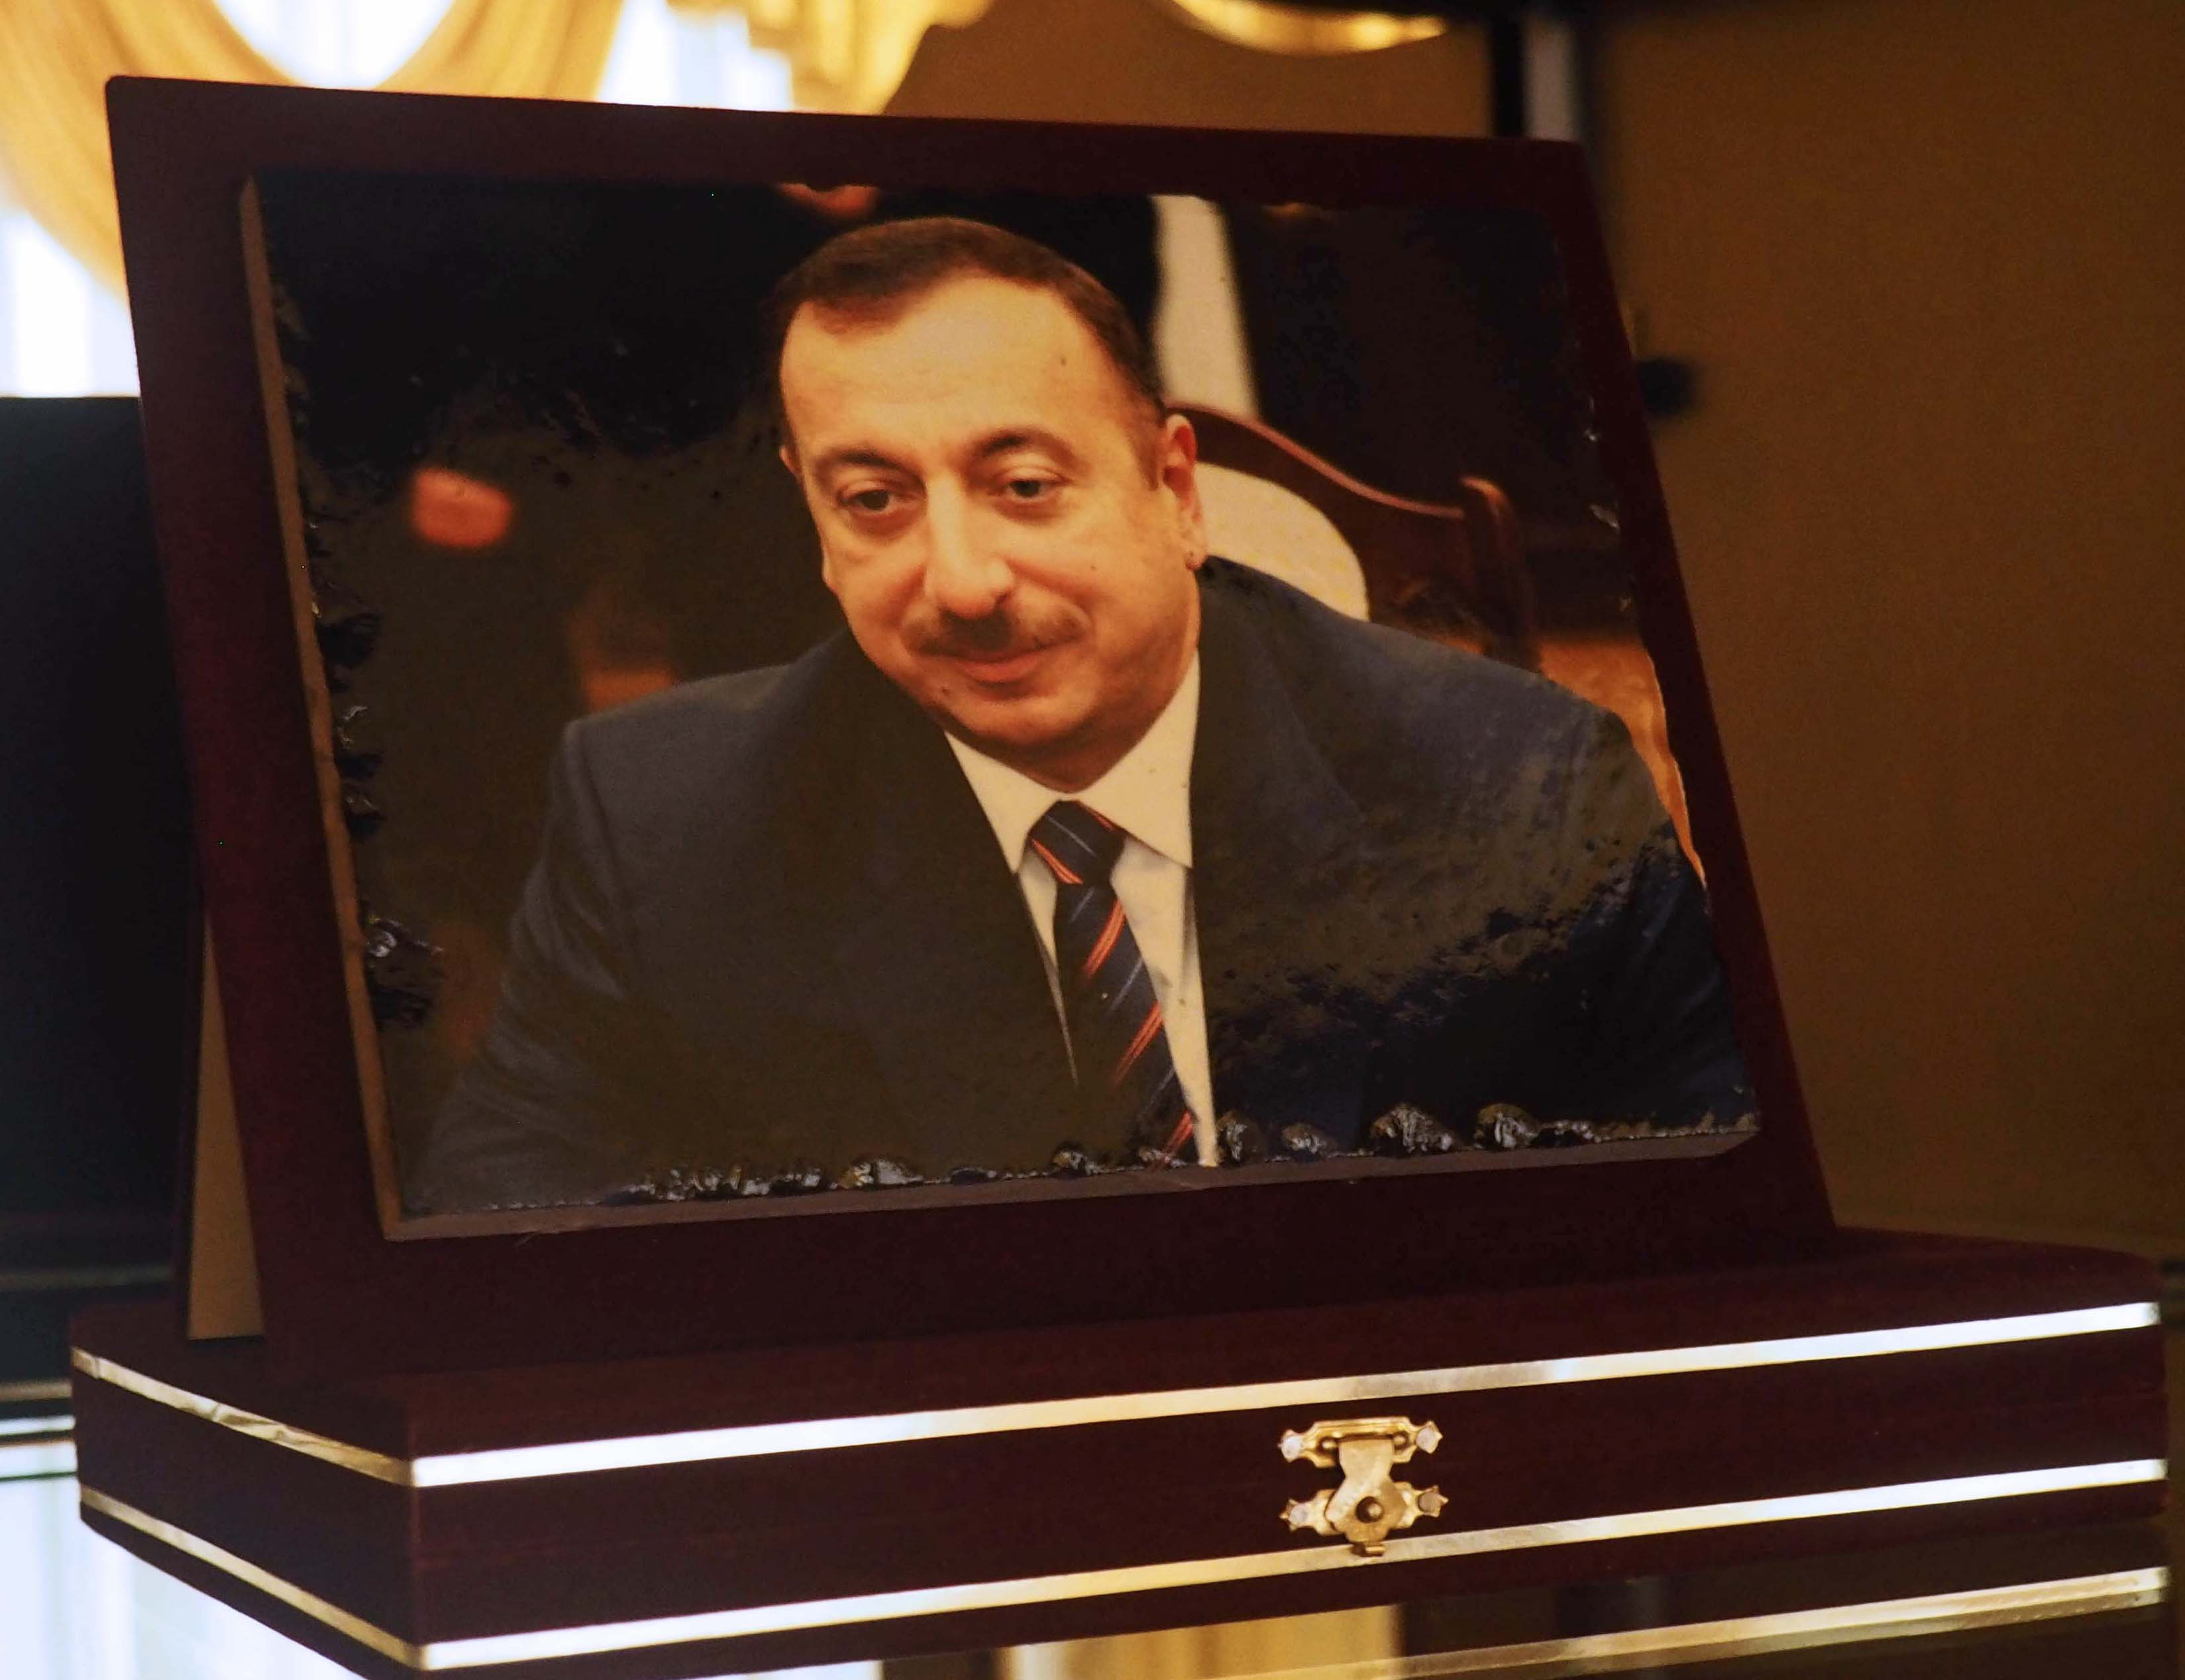 Azerbaijan's current president, Ilham Aliyev